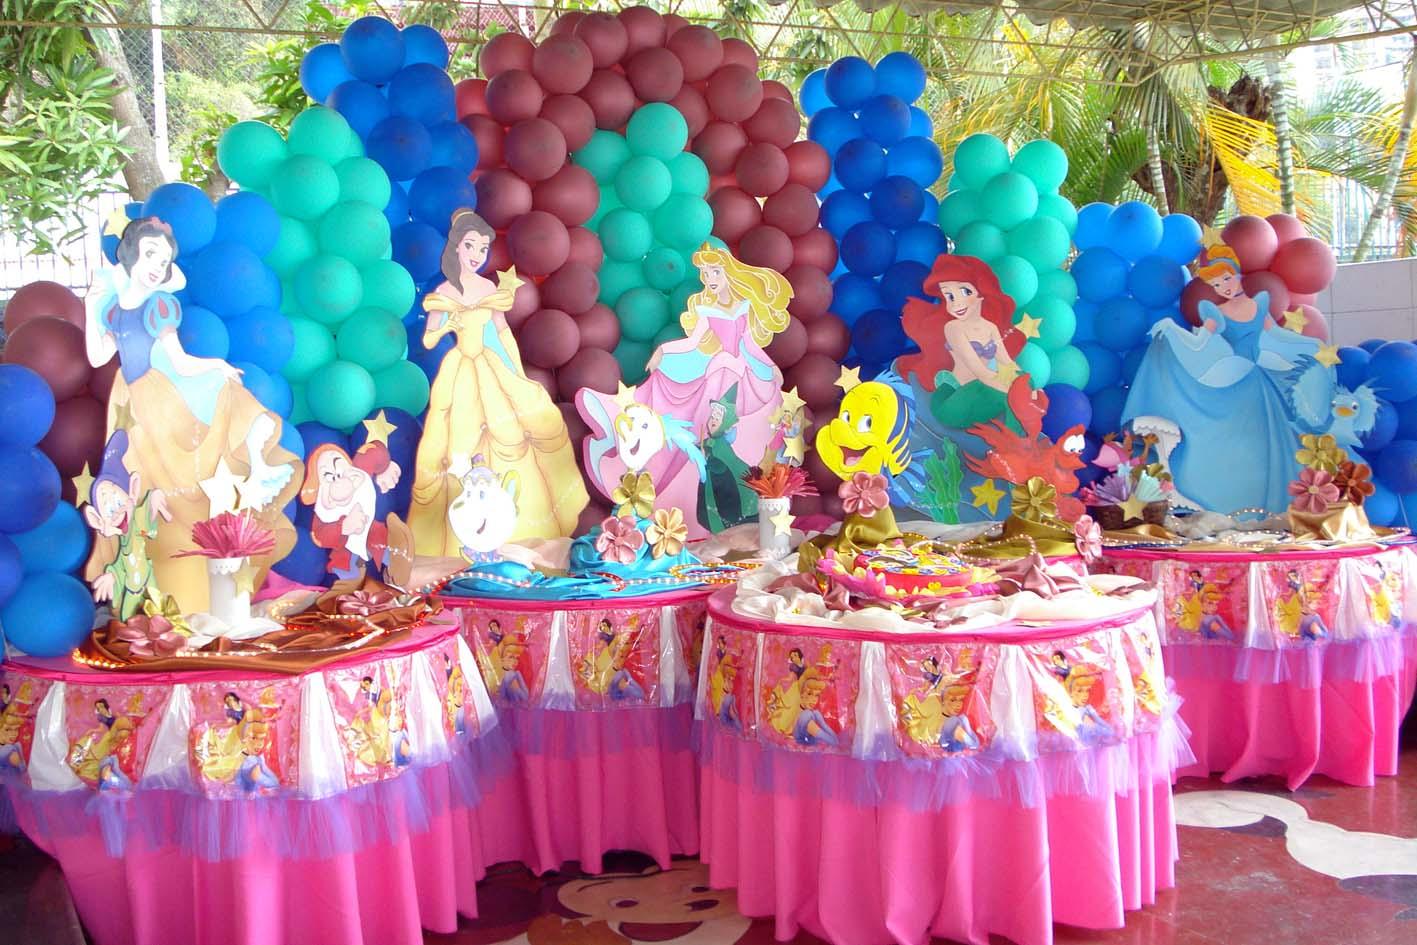 Mesas decoradas para fiestas infantiles princesas imagui for Mesas decoradas para fiestas